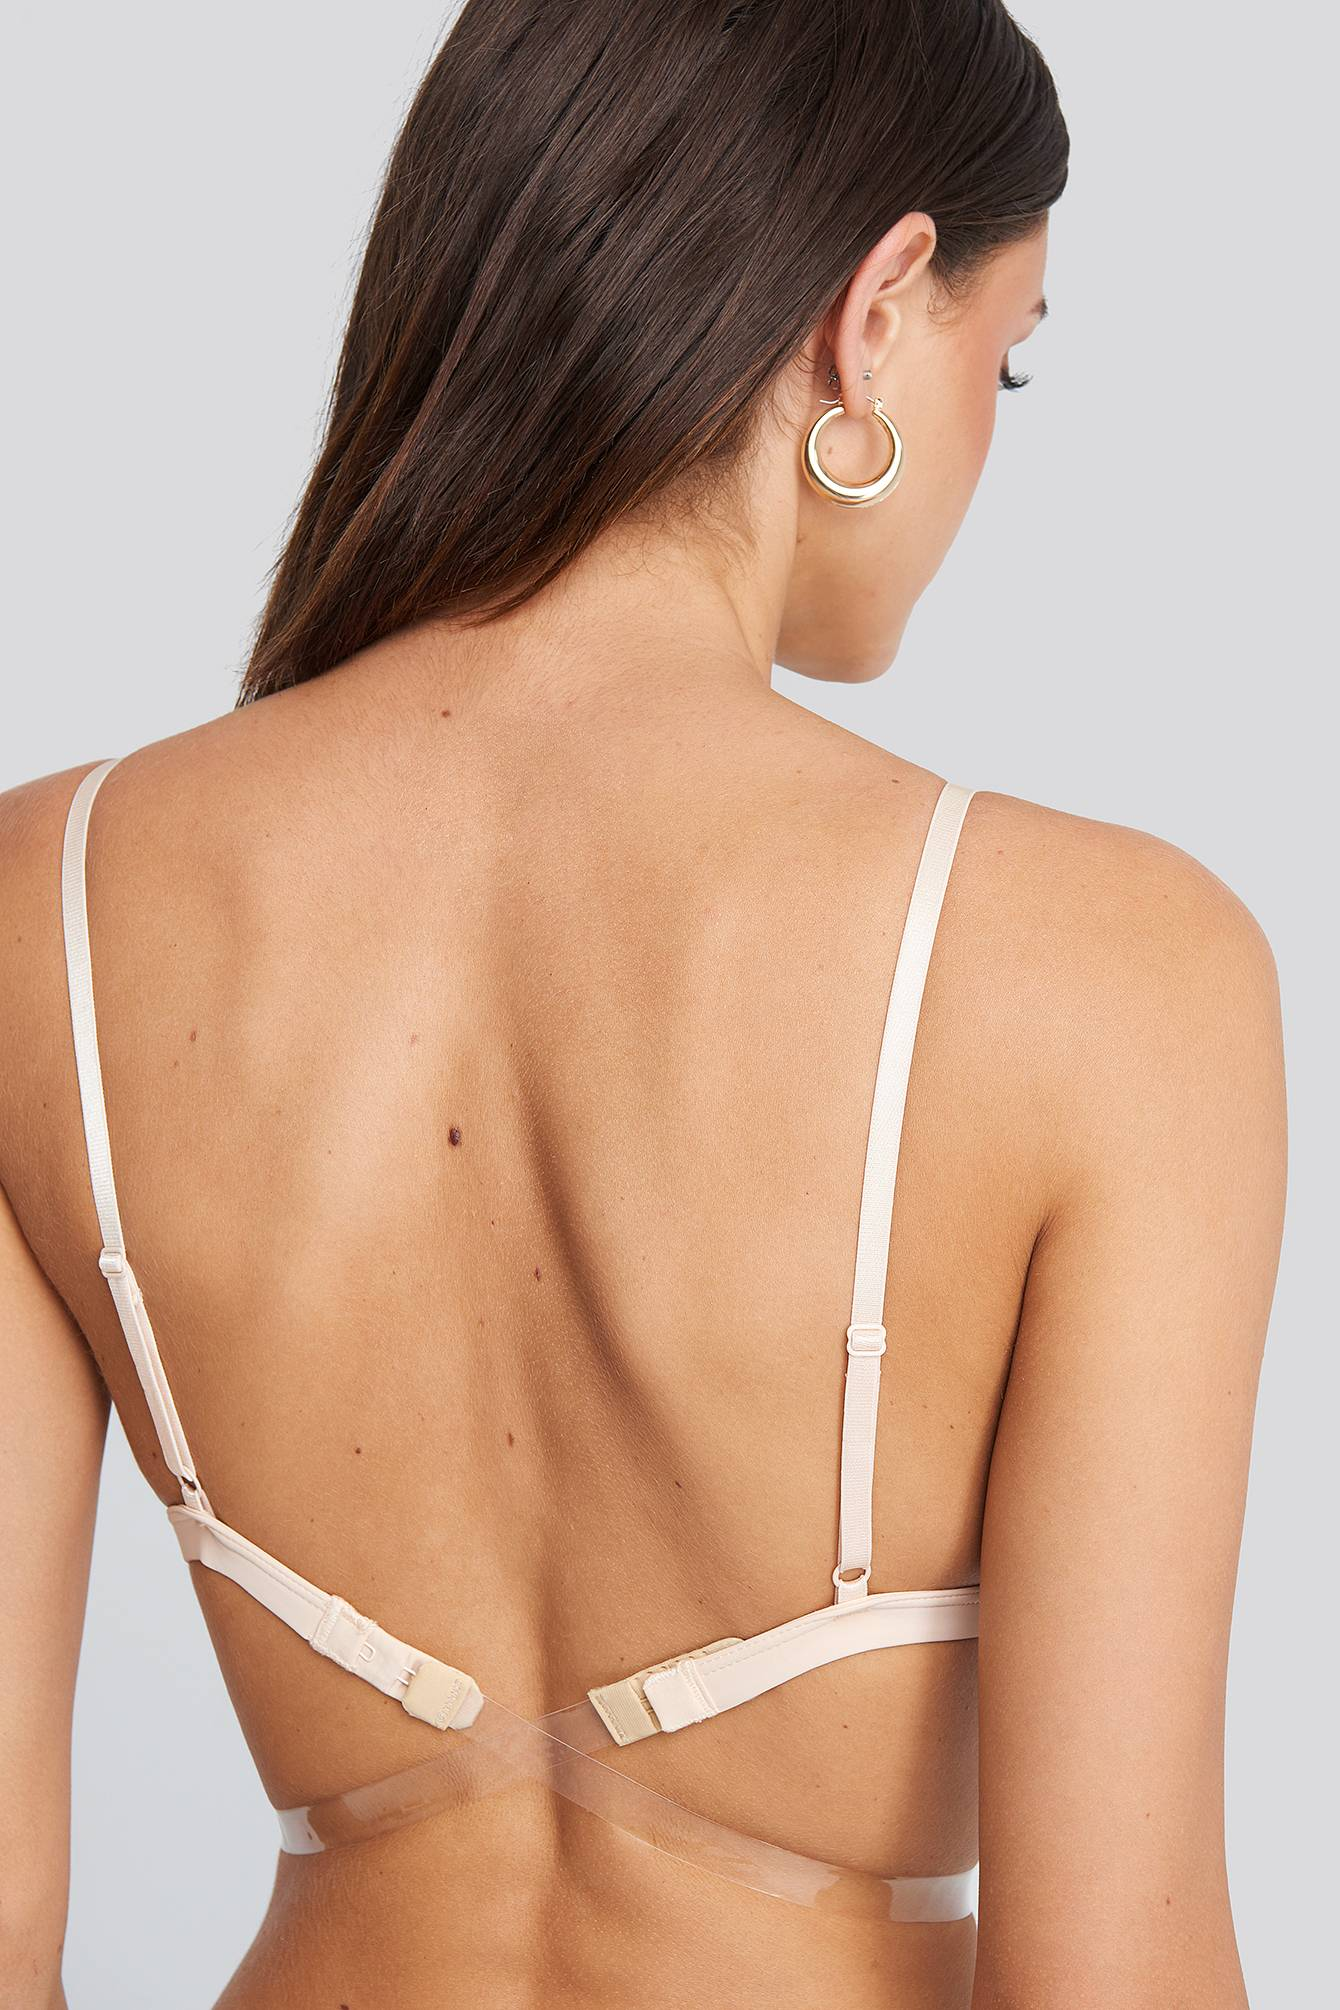 Freebra Low back Strap - White  - Size: One Size